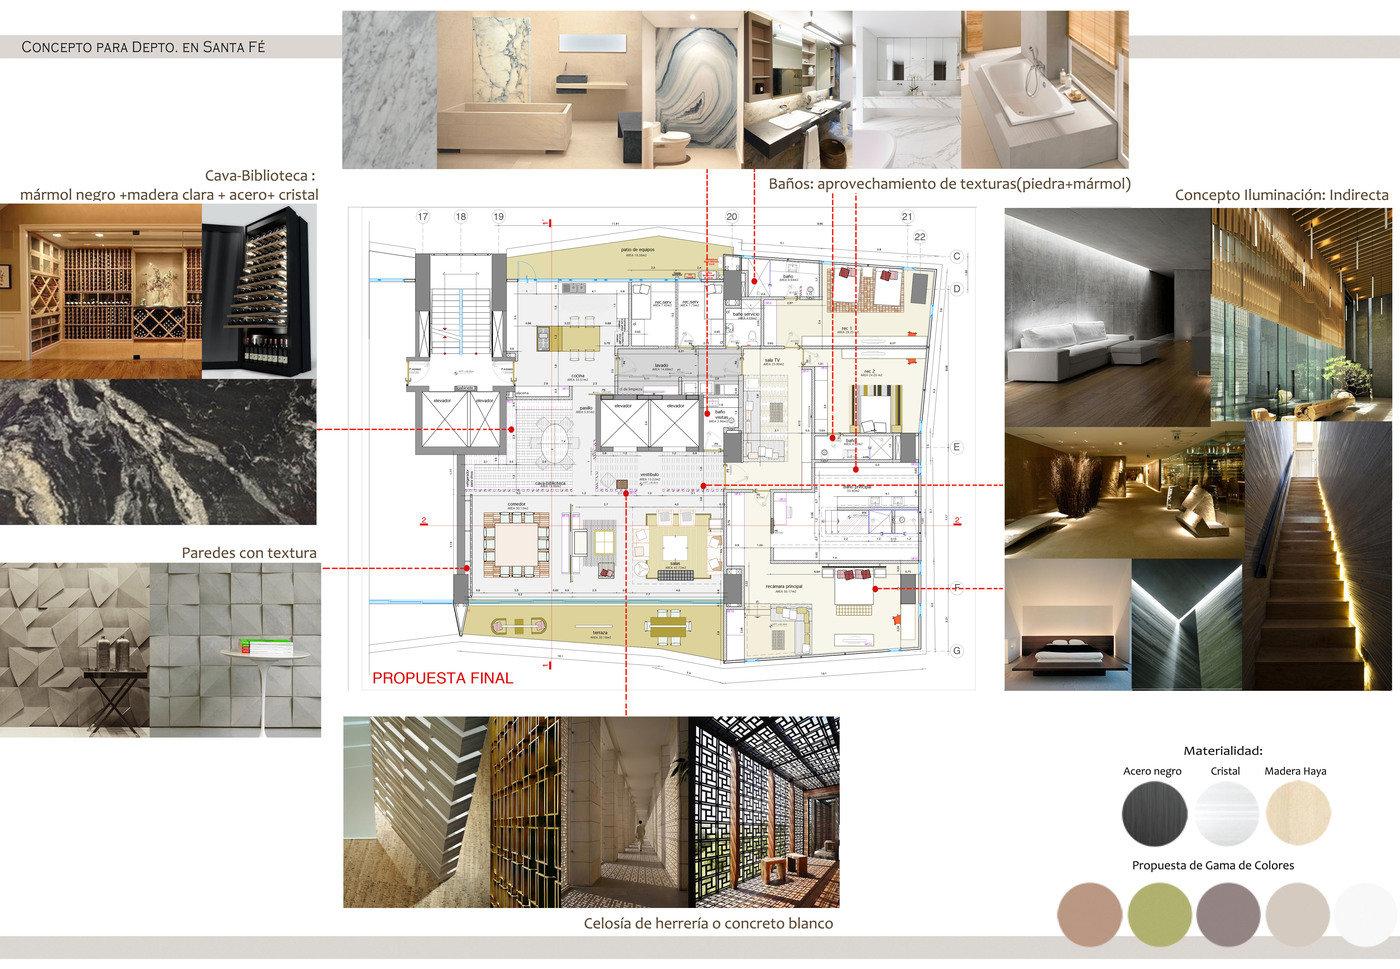 Dise o interior by martha mar a mondrag n marroqu n at - Proyecto de diseno de interiores ...